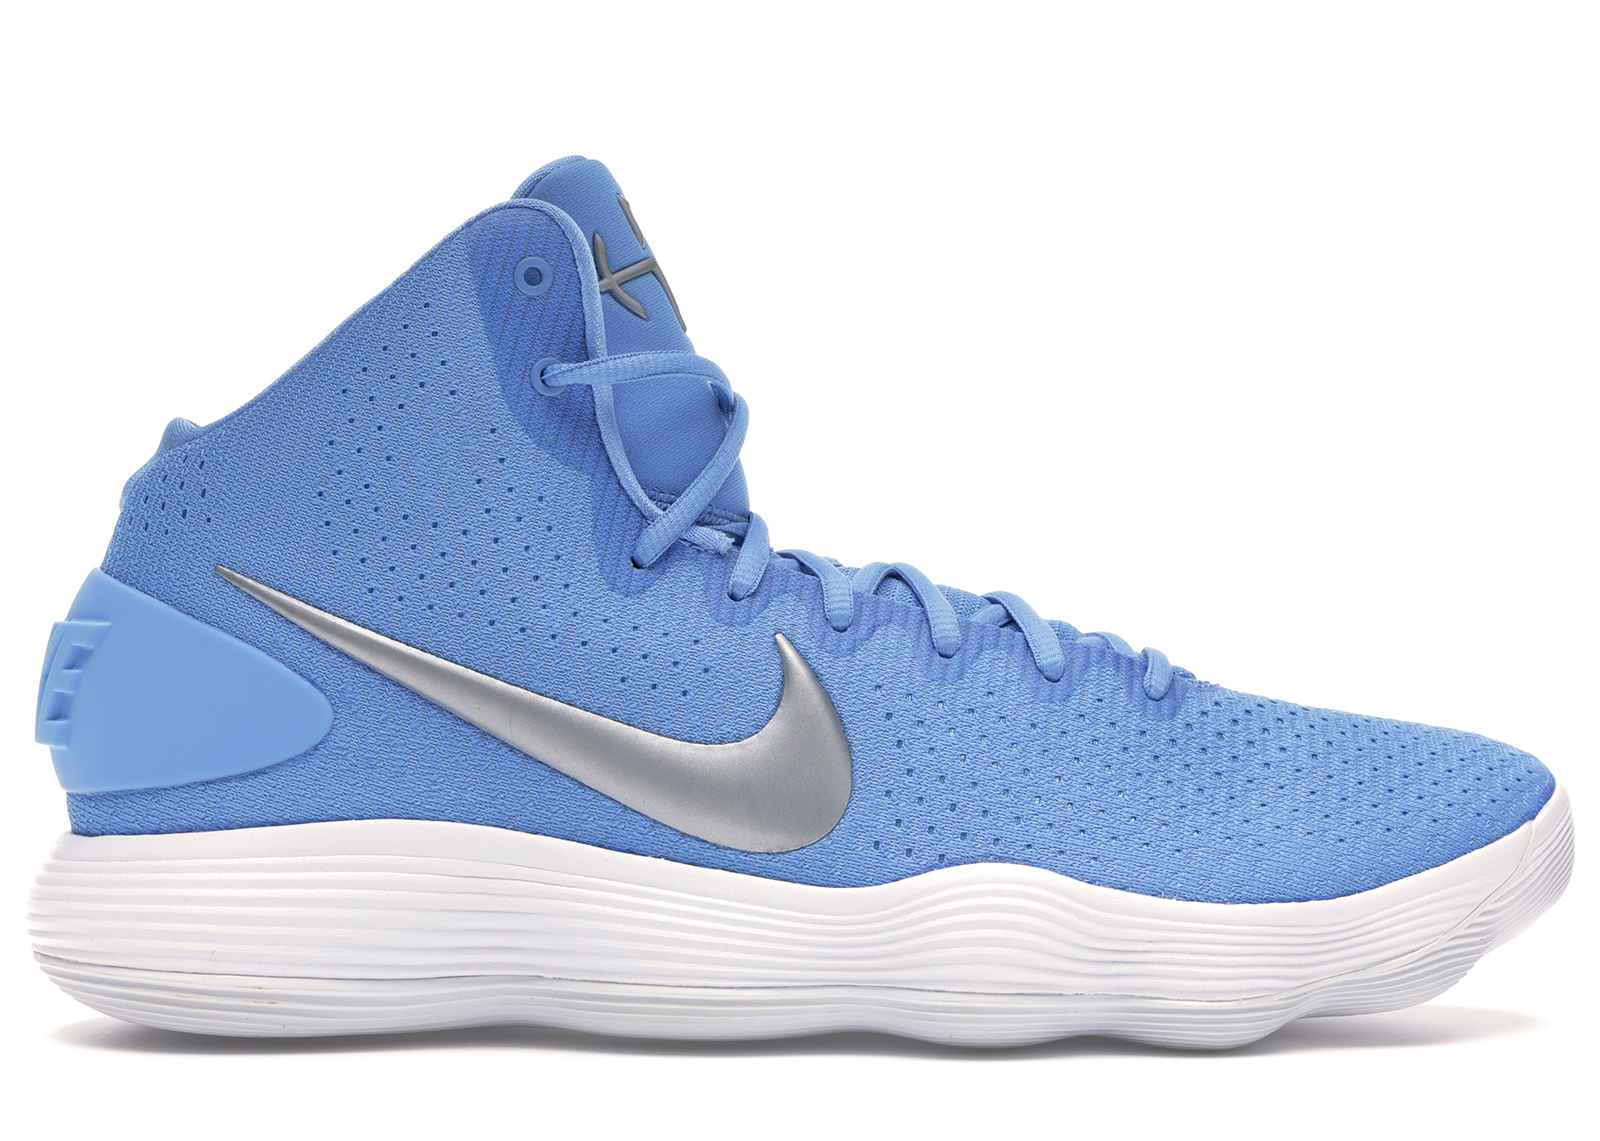 Nike Hyperdunk 2017 University Blue